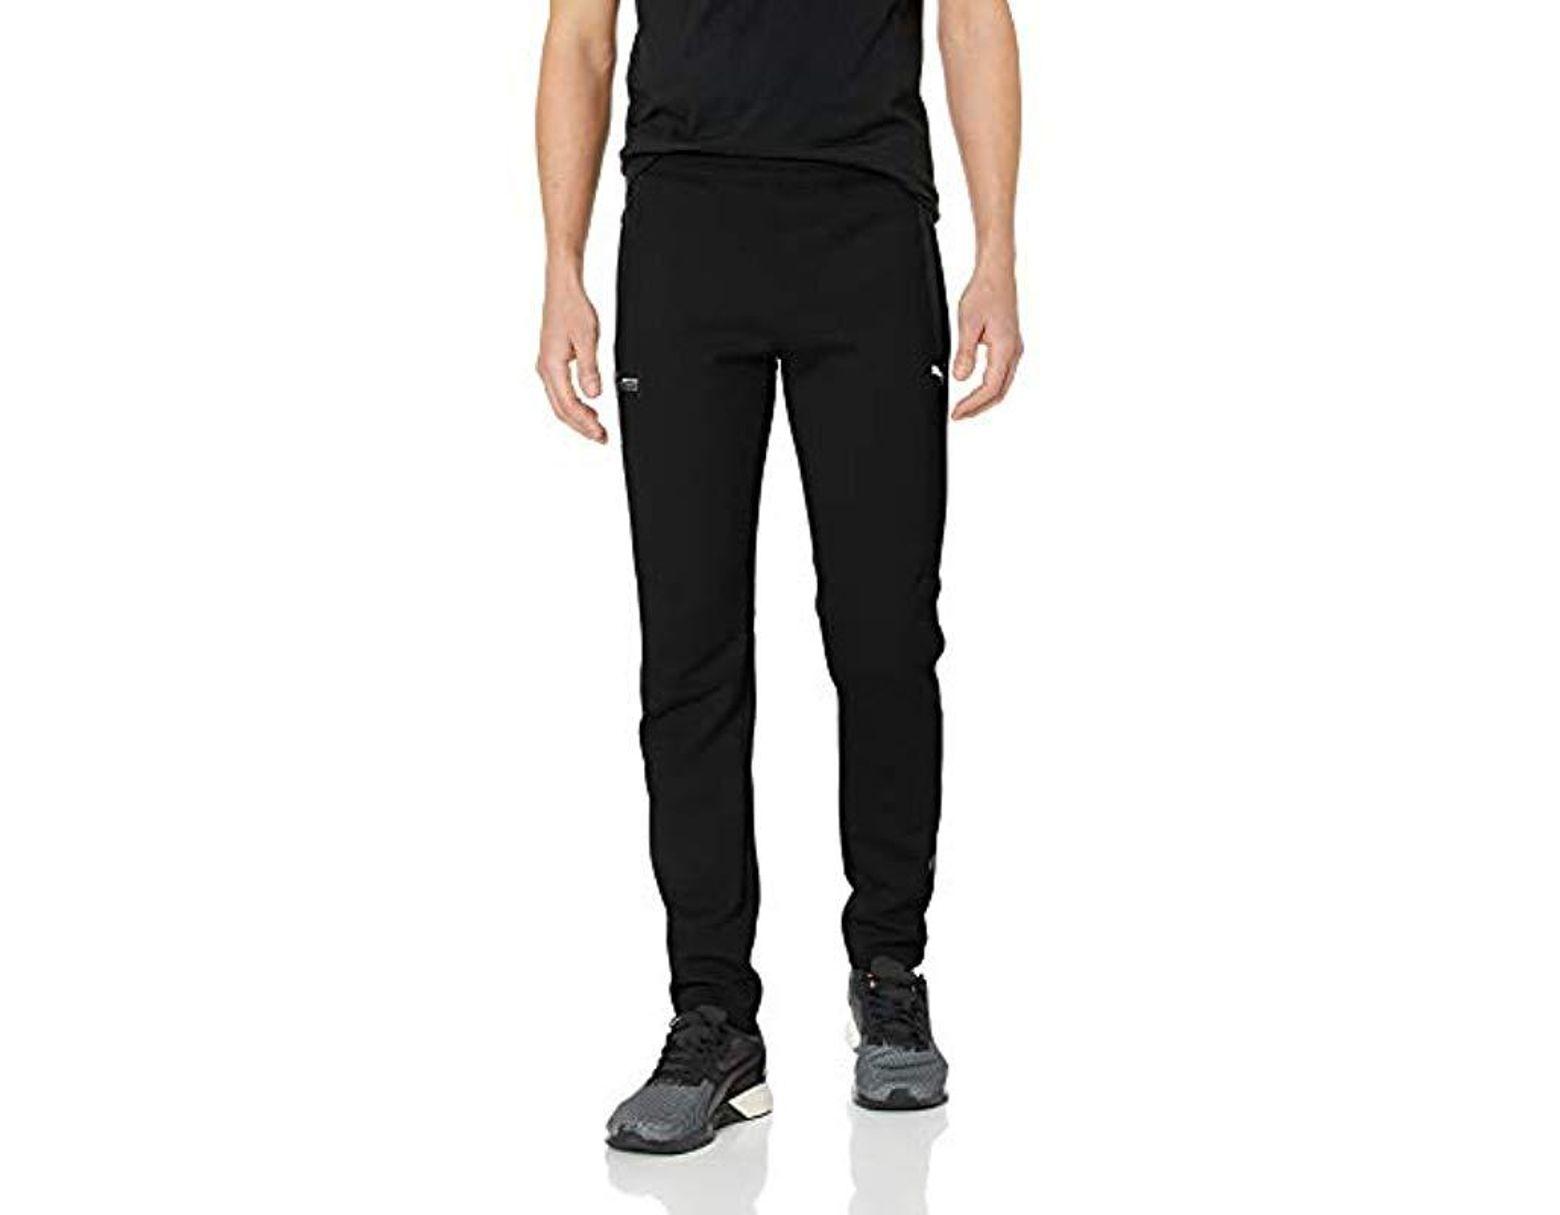 Black Men's Sweat Pants Mapm Mercedes 3c54ARLqj